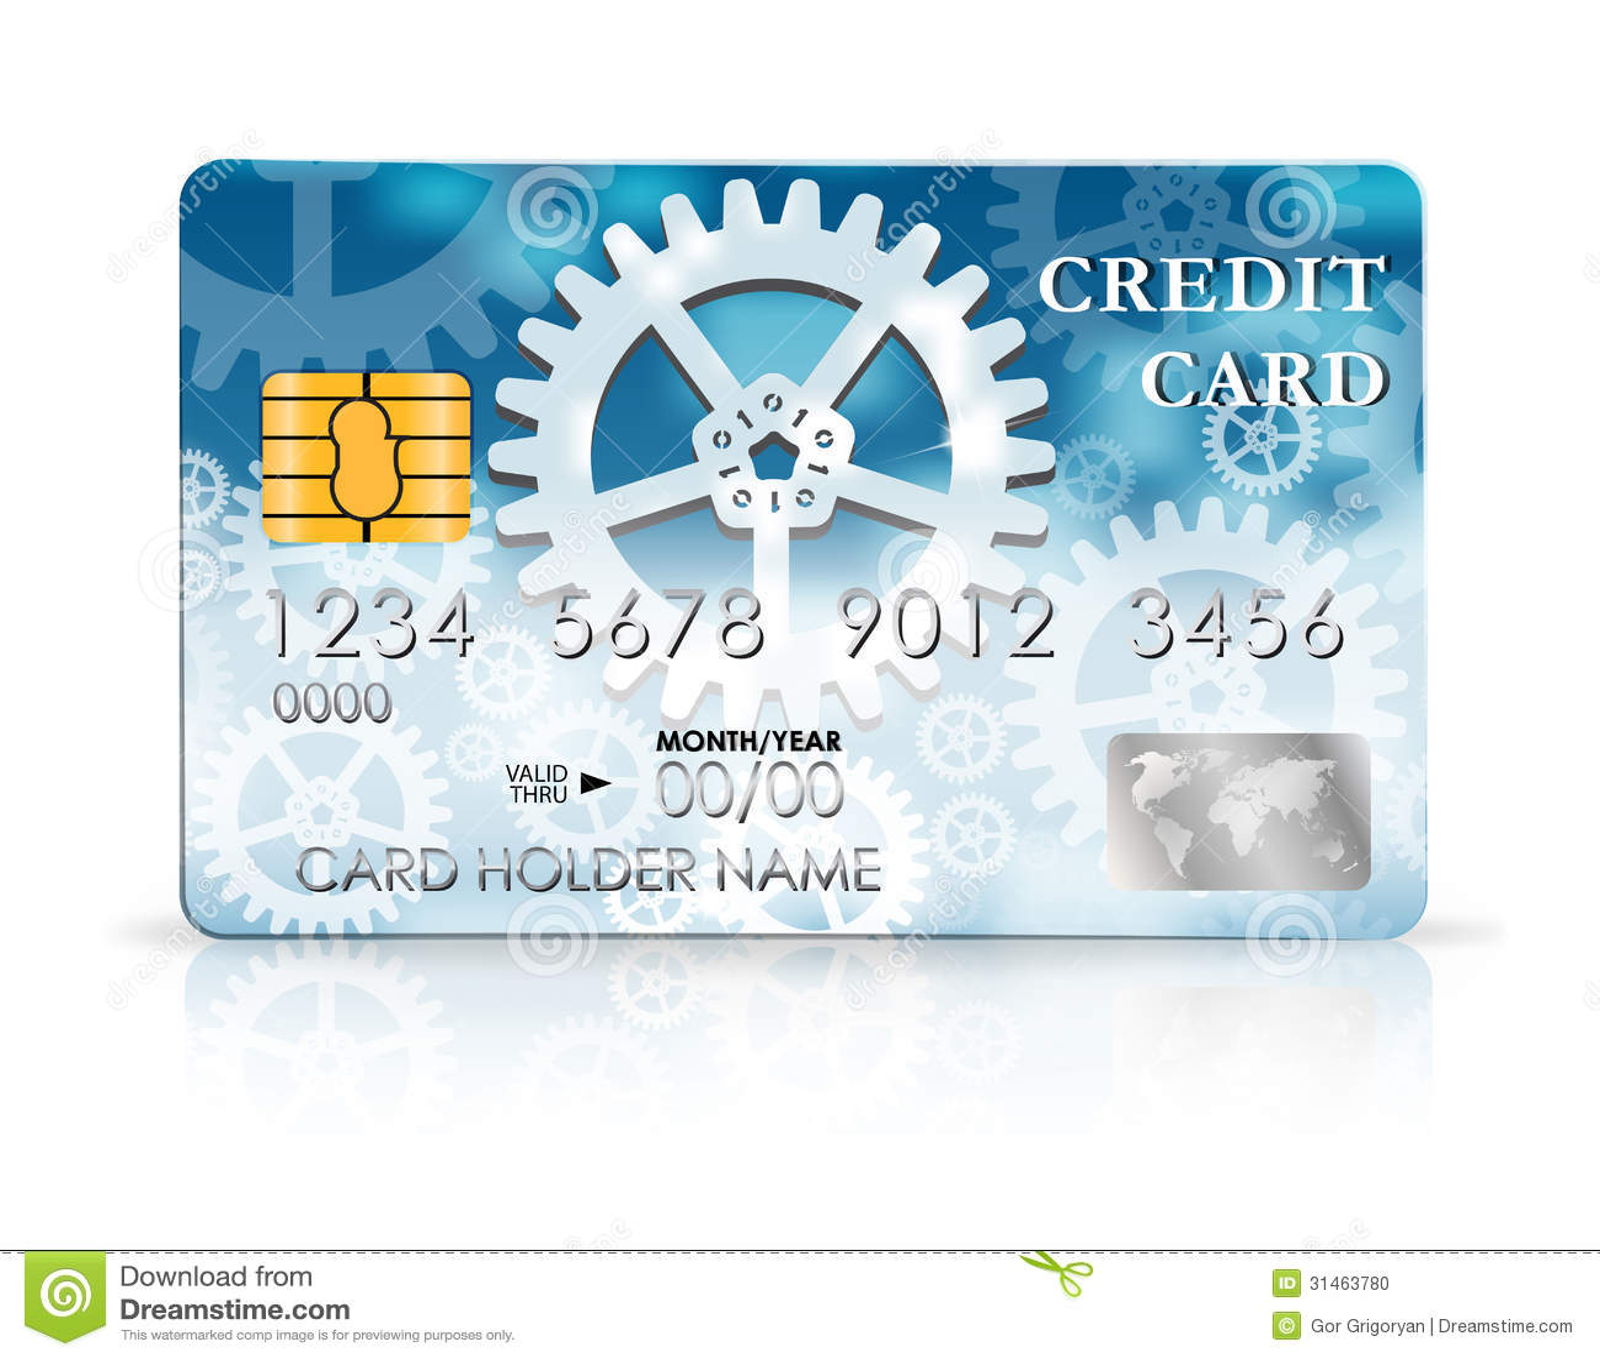 credit card design template stock photo image 31463780. Black Bedroom Furniture Sets. Home Design Ideas